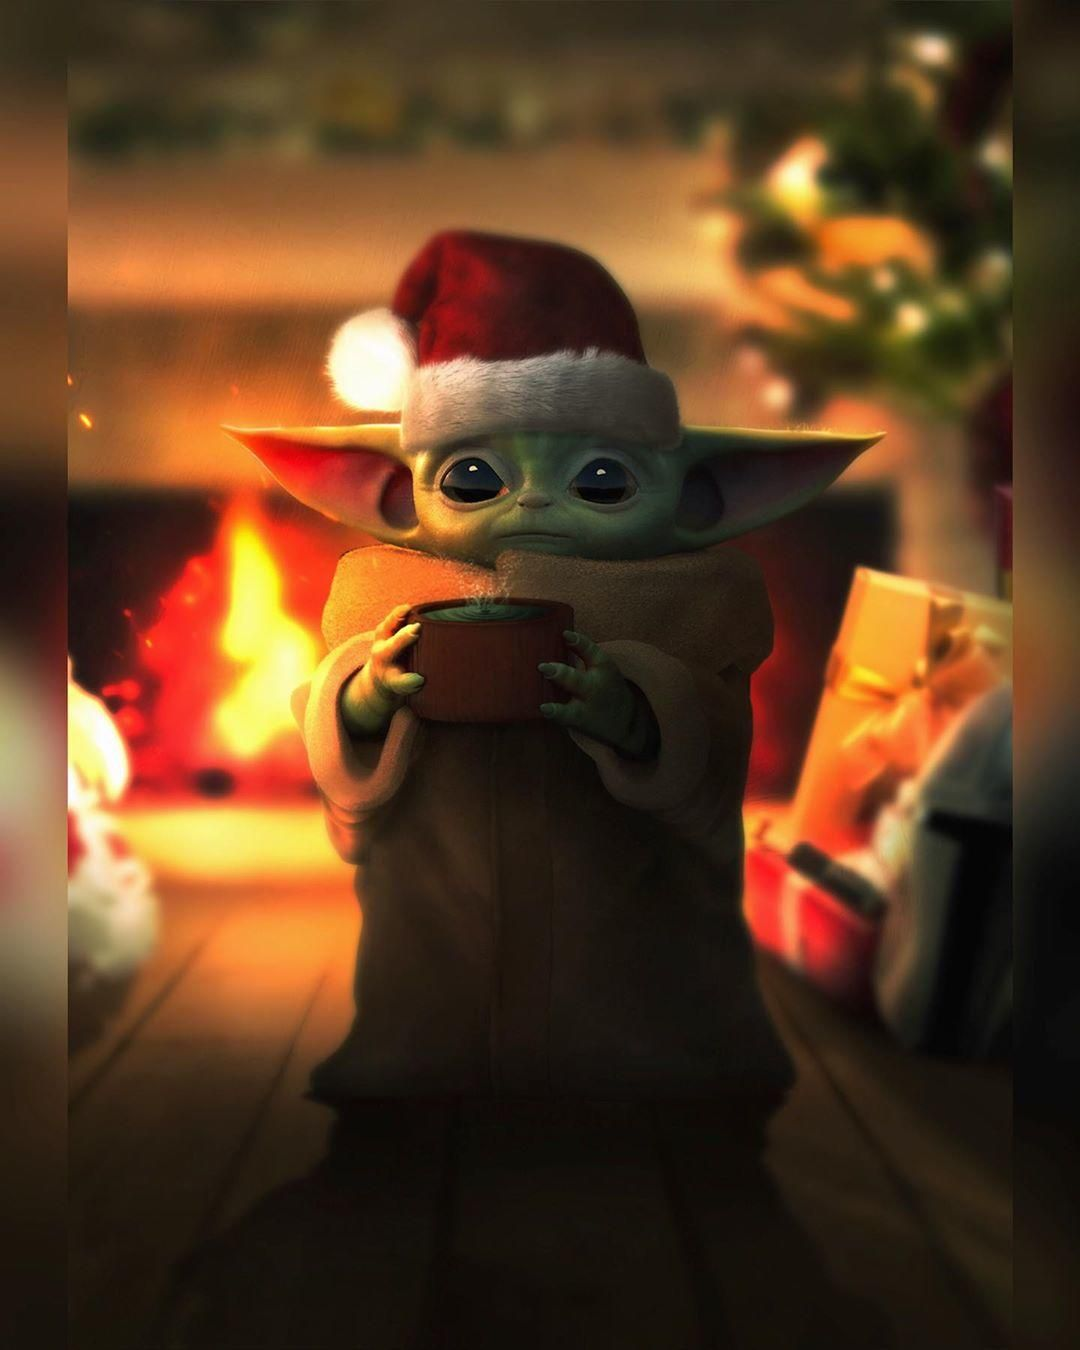 Christmas Baby Yoda - Credit to @mizuriofficial |